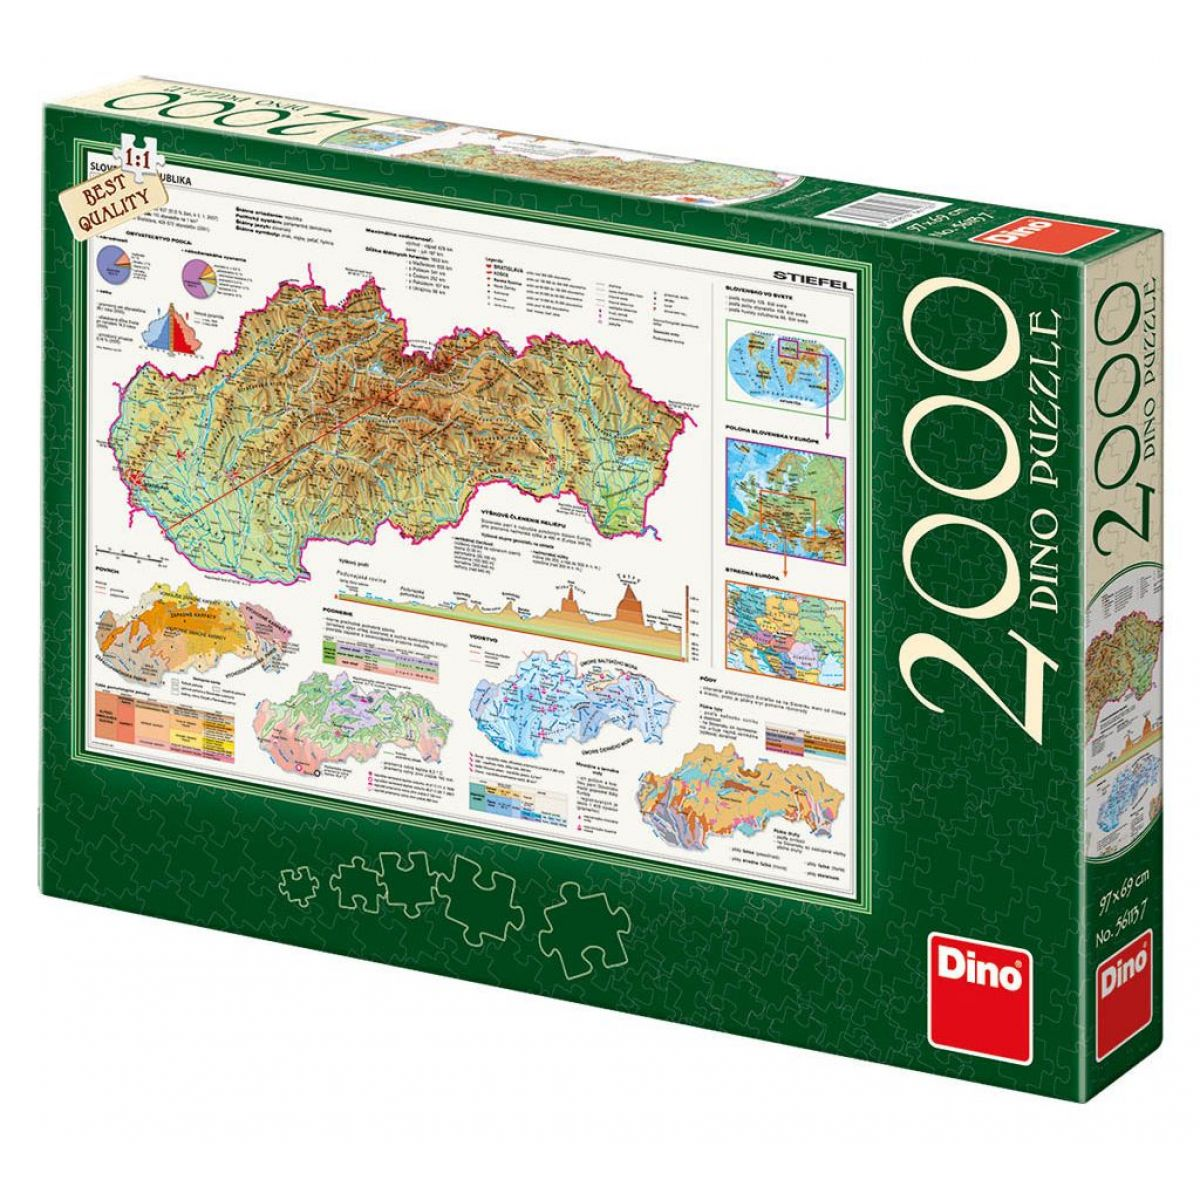 Dino Mapy Slovenska puzzle 2000 dílků